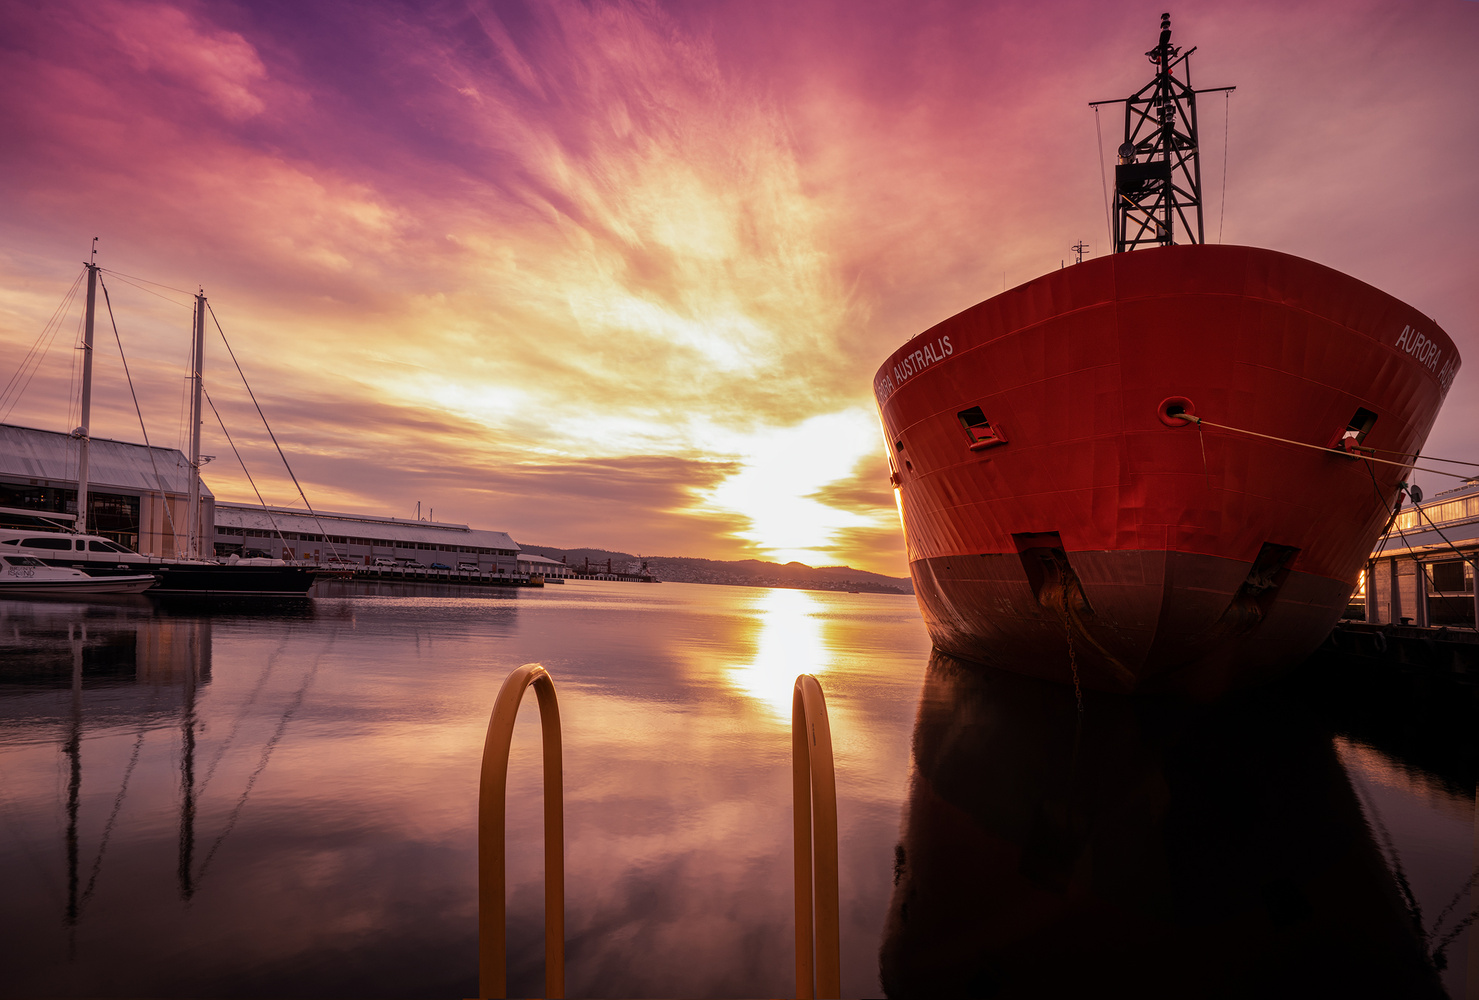 Australian icebreaker by Bobby Bedi